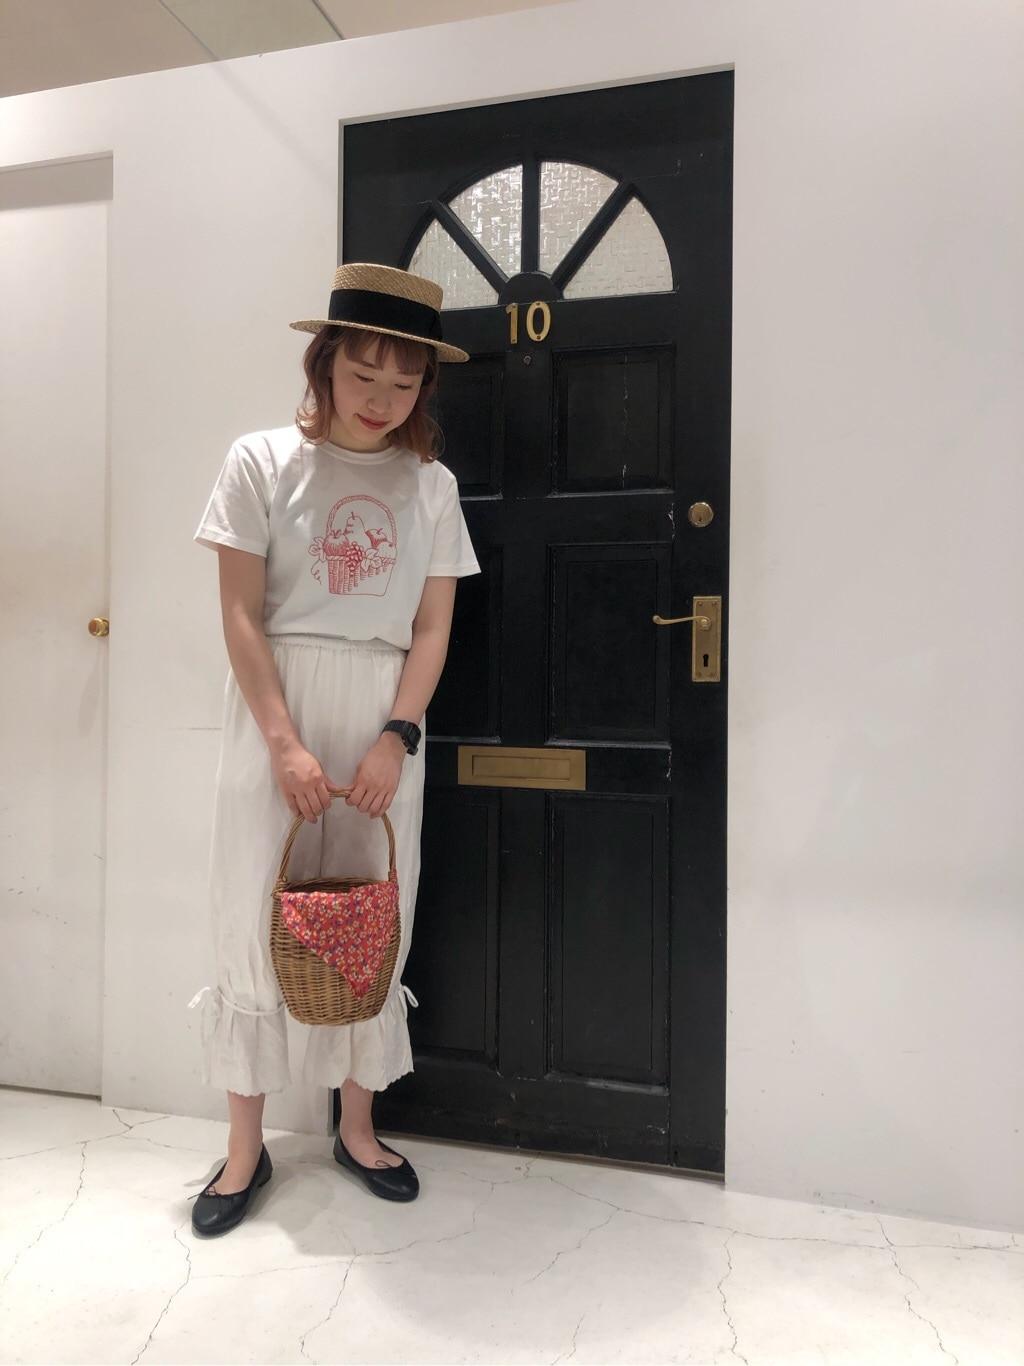 Dot and Stripes CHILD WOMAN ルクアイーレ 身長:157cm 2020.06.06